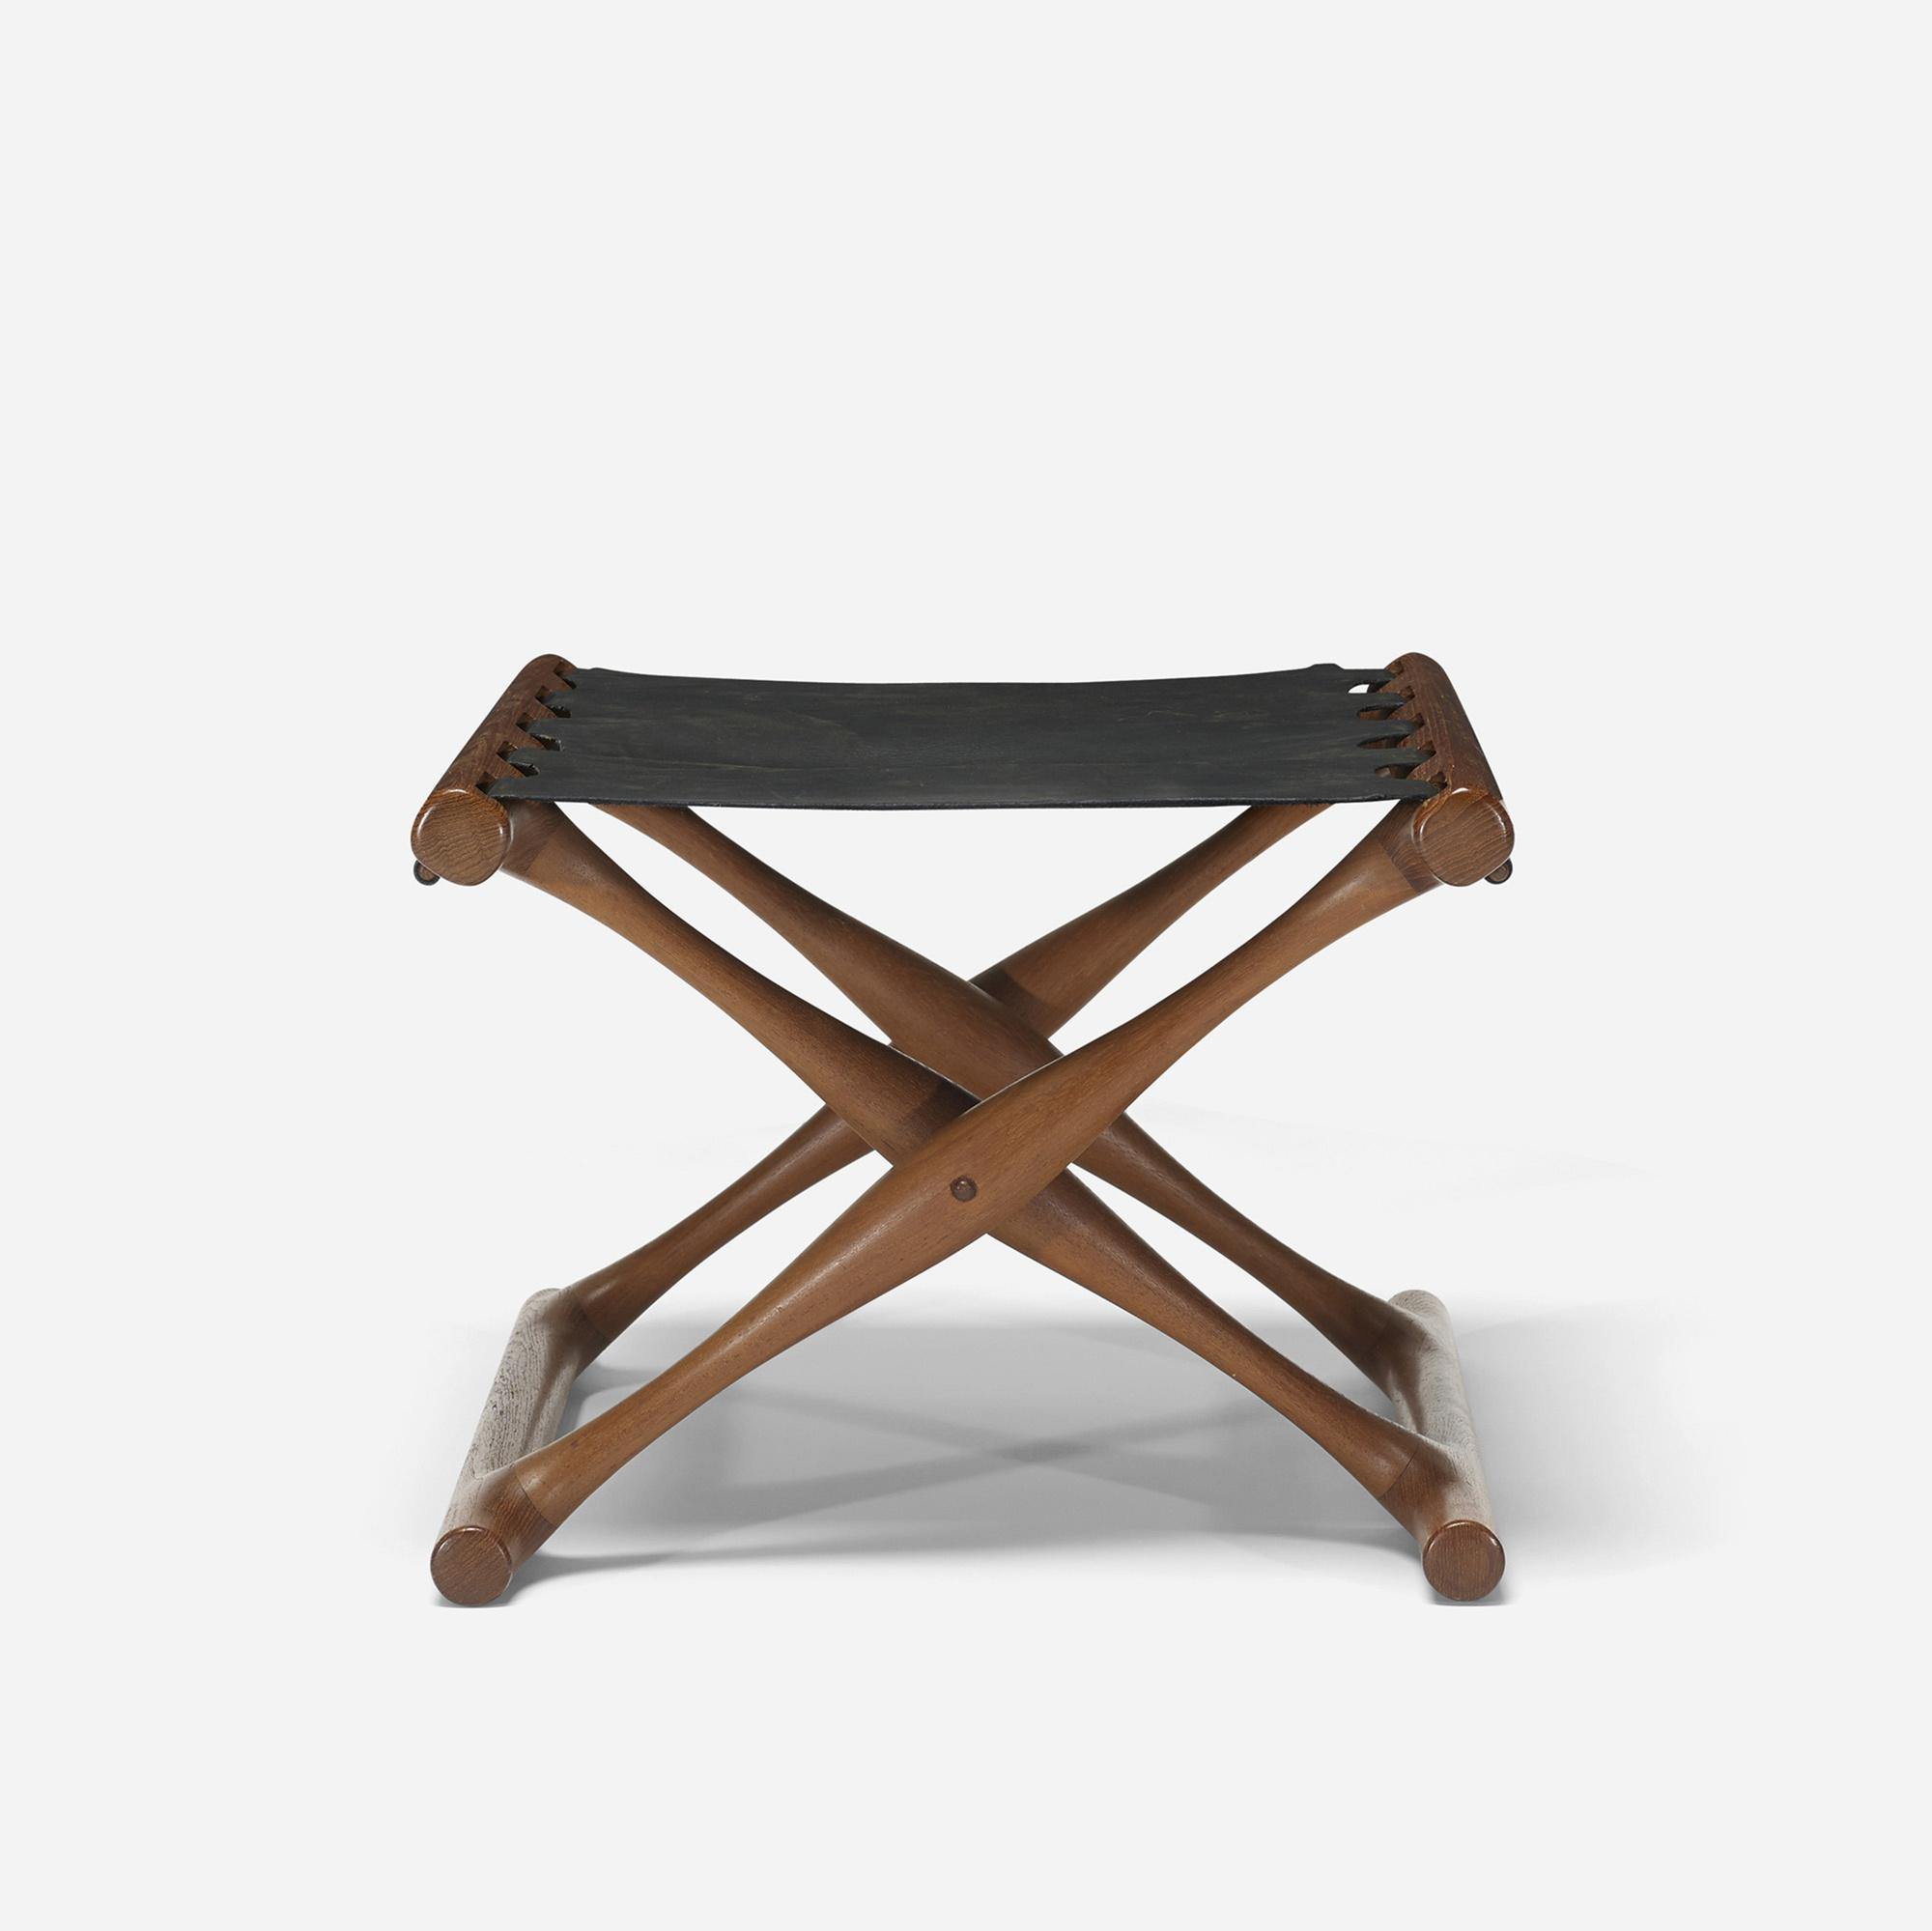 362: Poul Hundevad / Guldhoj folding stool (2 of 3)